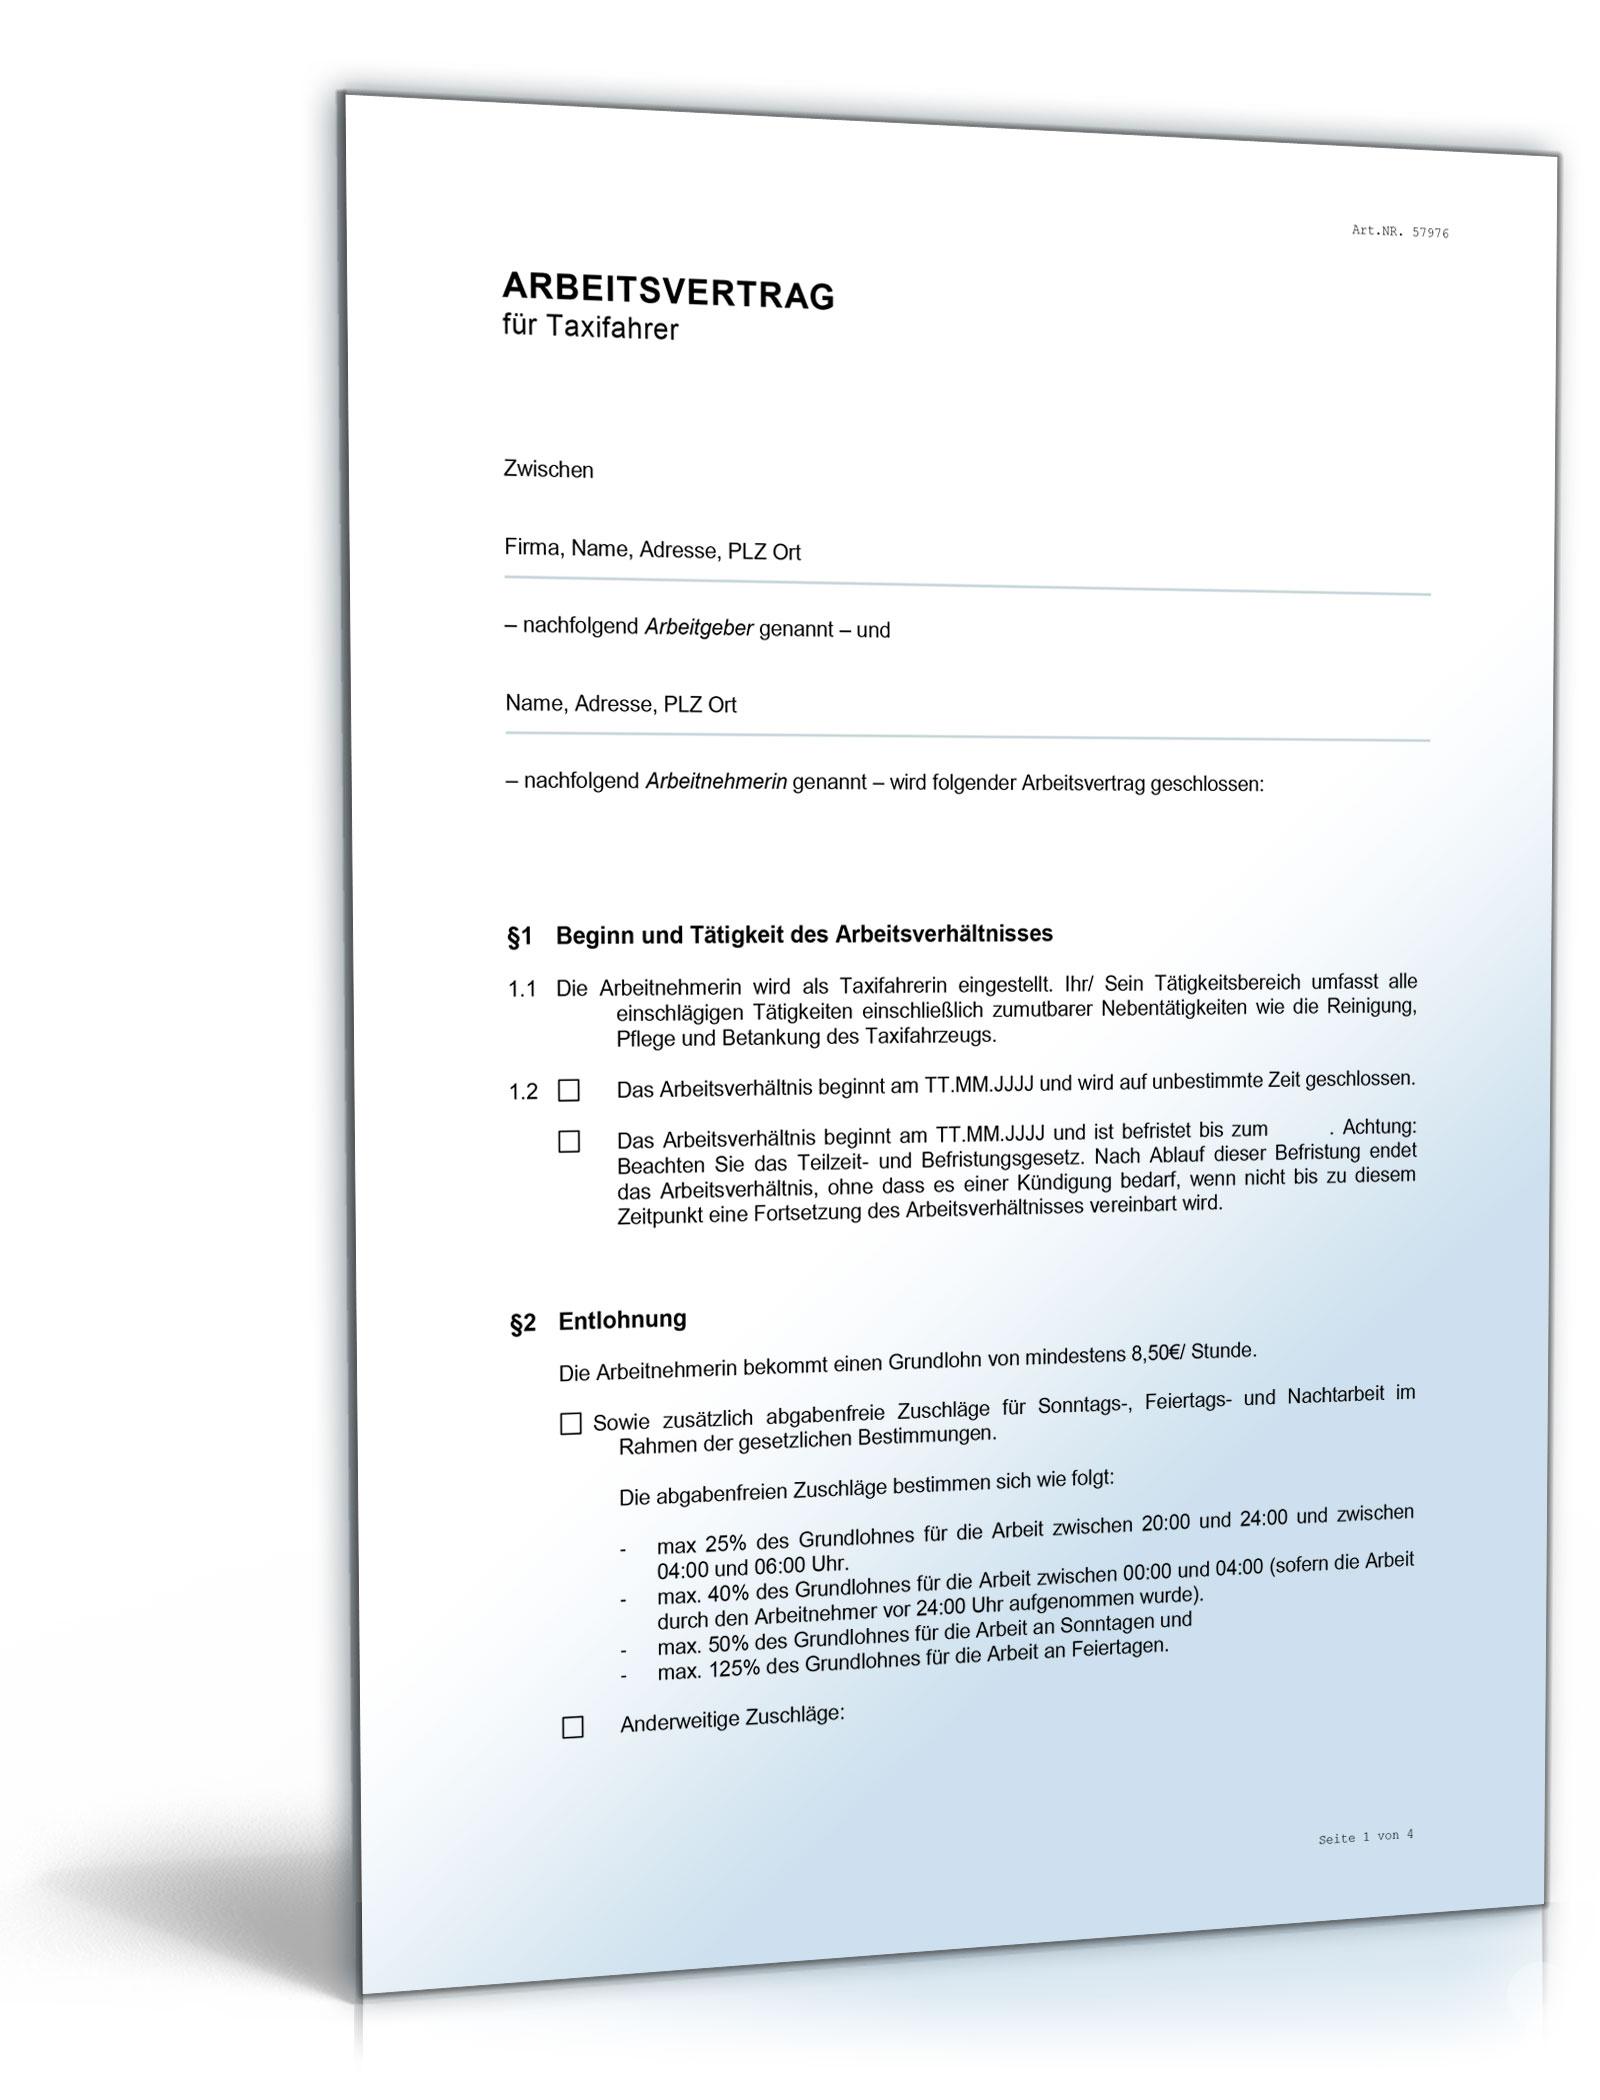 Arbeitsvertrag Taxifahrer Word Dokument Amazonde Software